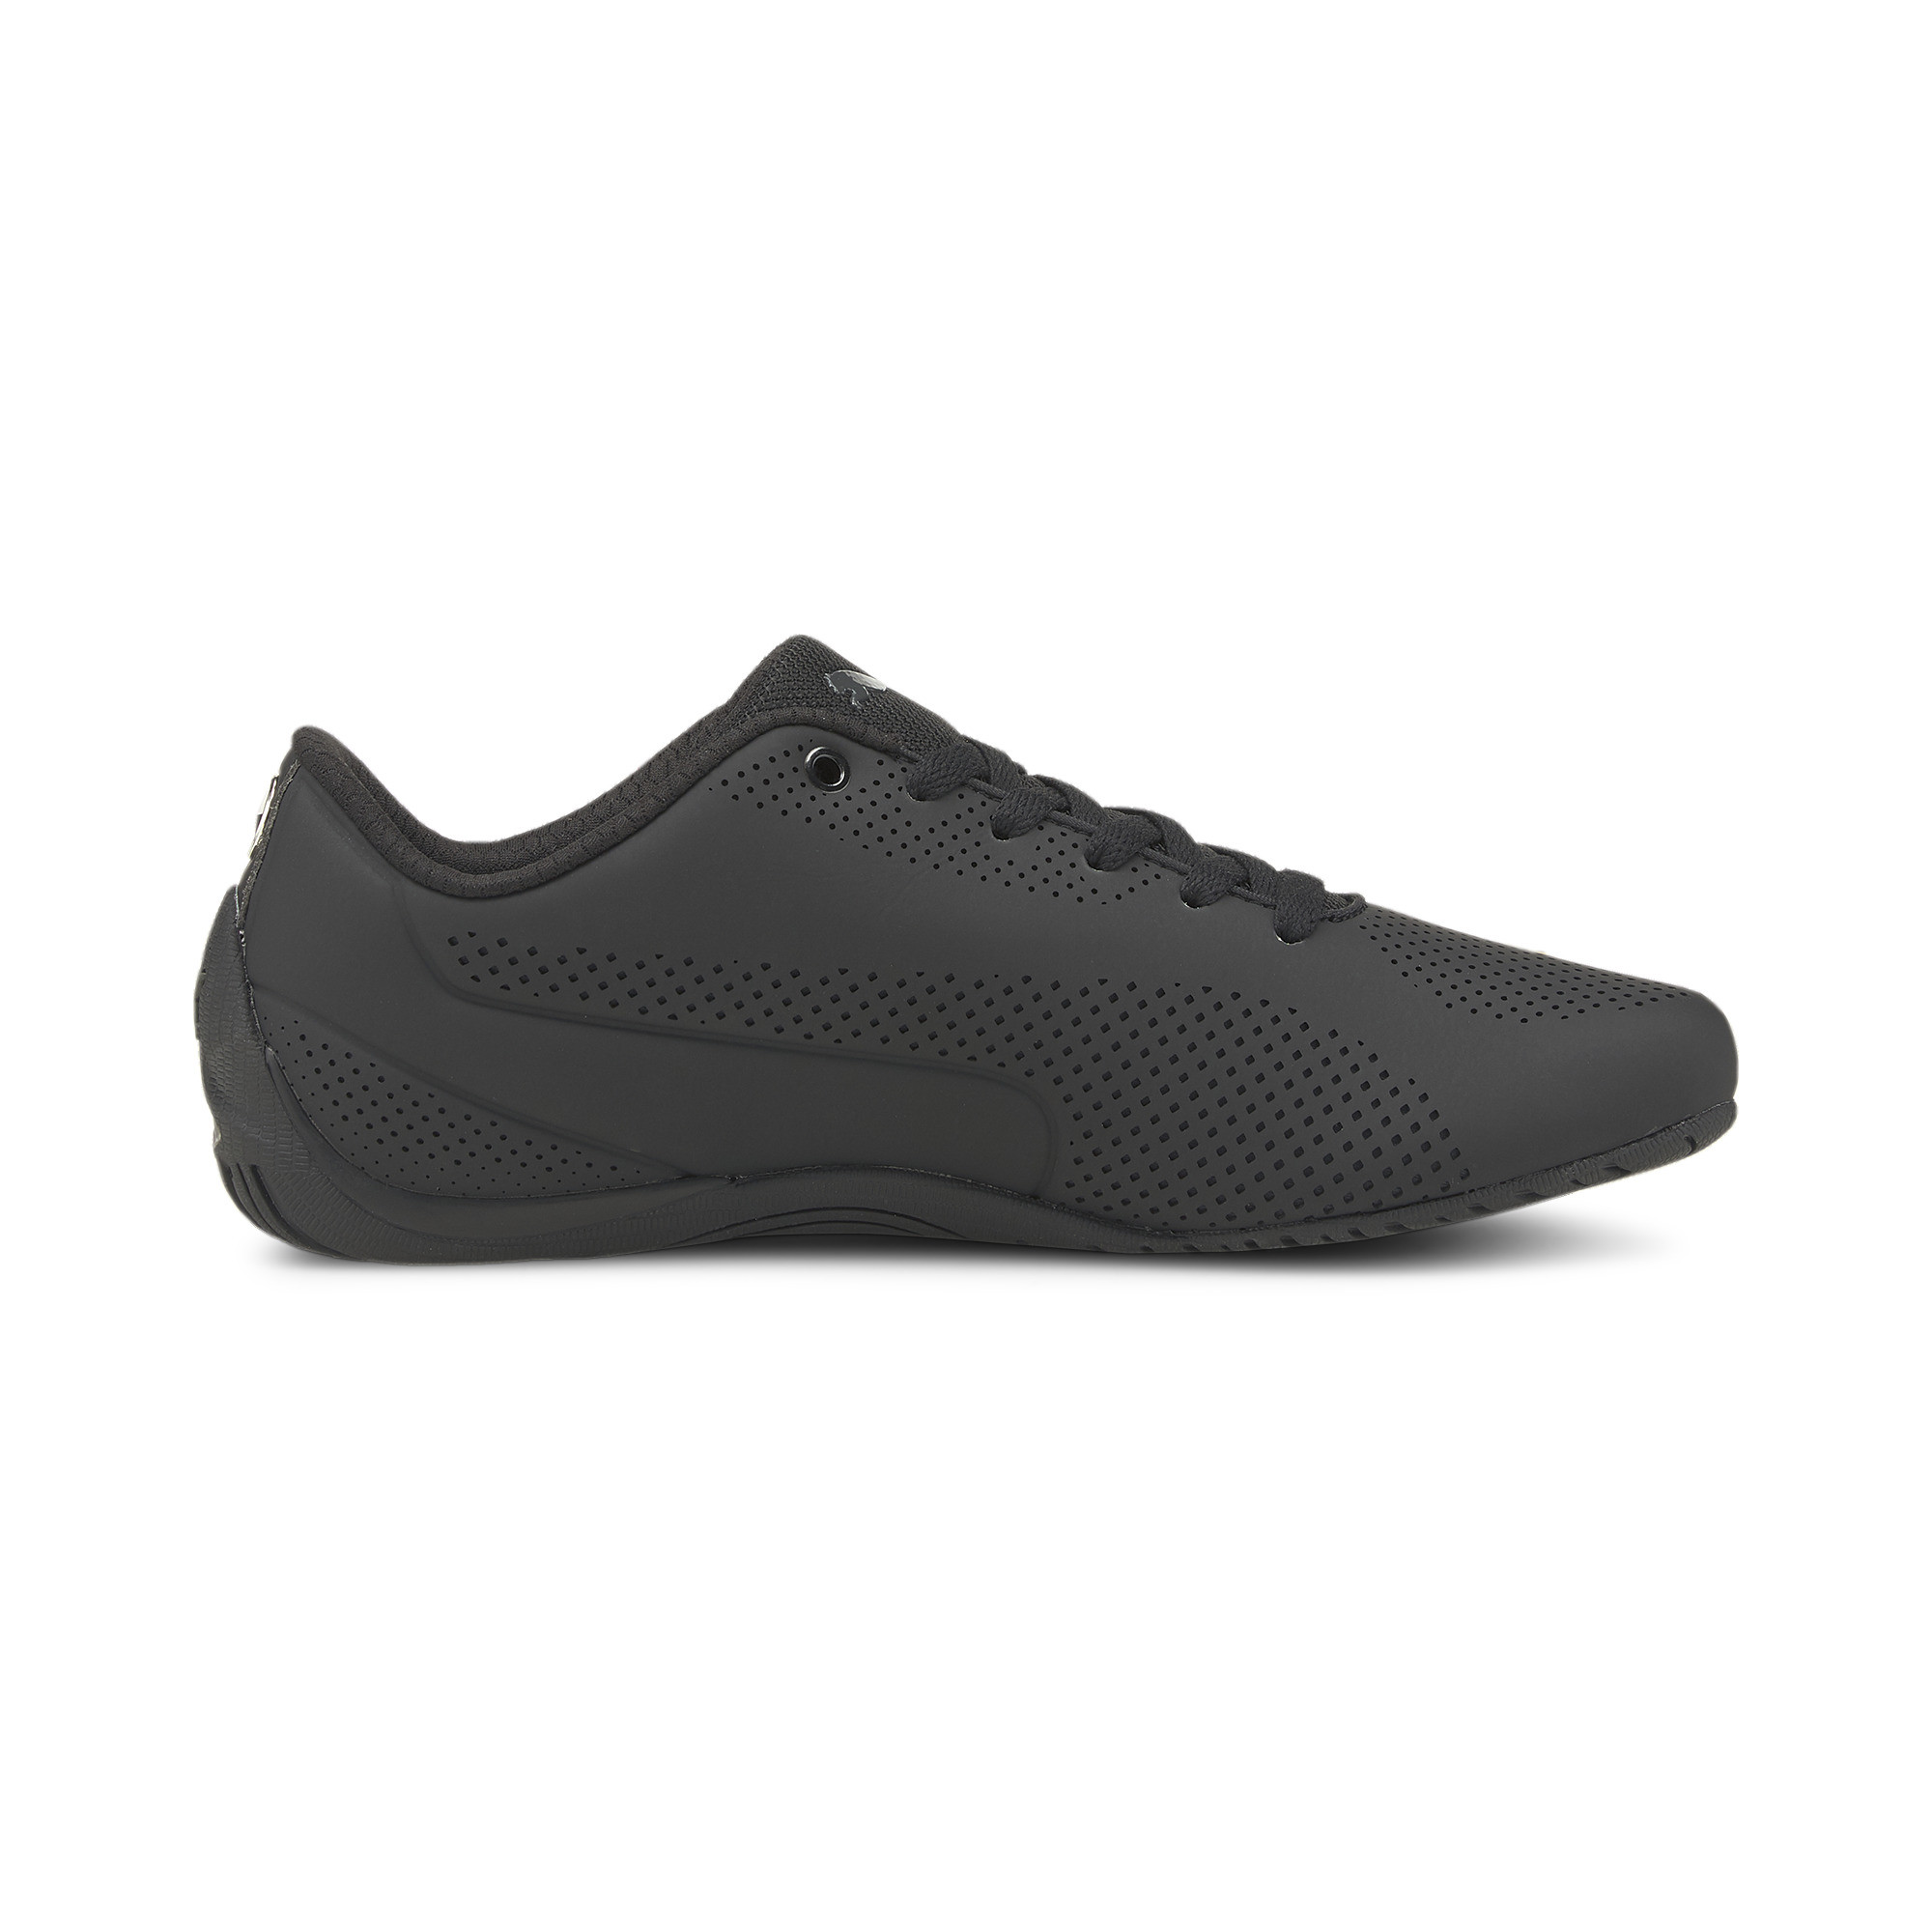 PUMA-MERCEDES-AMG-PETRONAS-Drift-Cat-Ultra-Sneaker-Unisex-Schuhe-Neu Indexbild 6